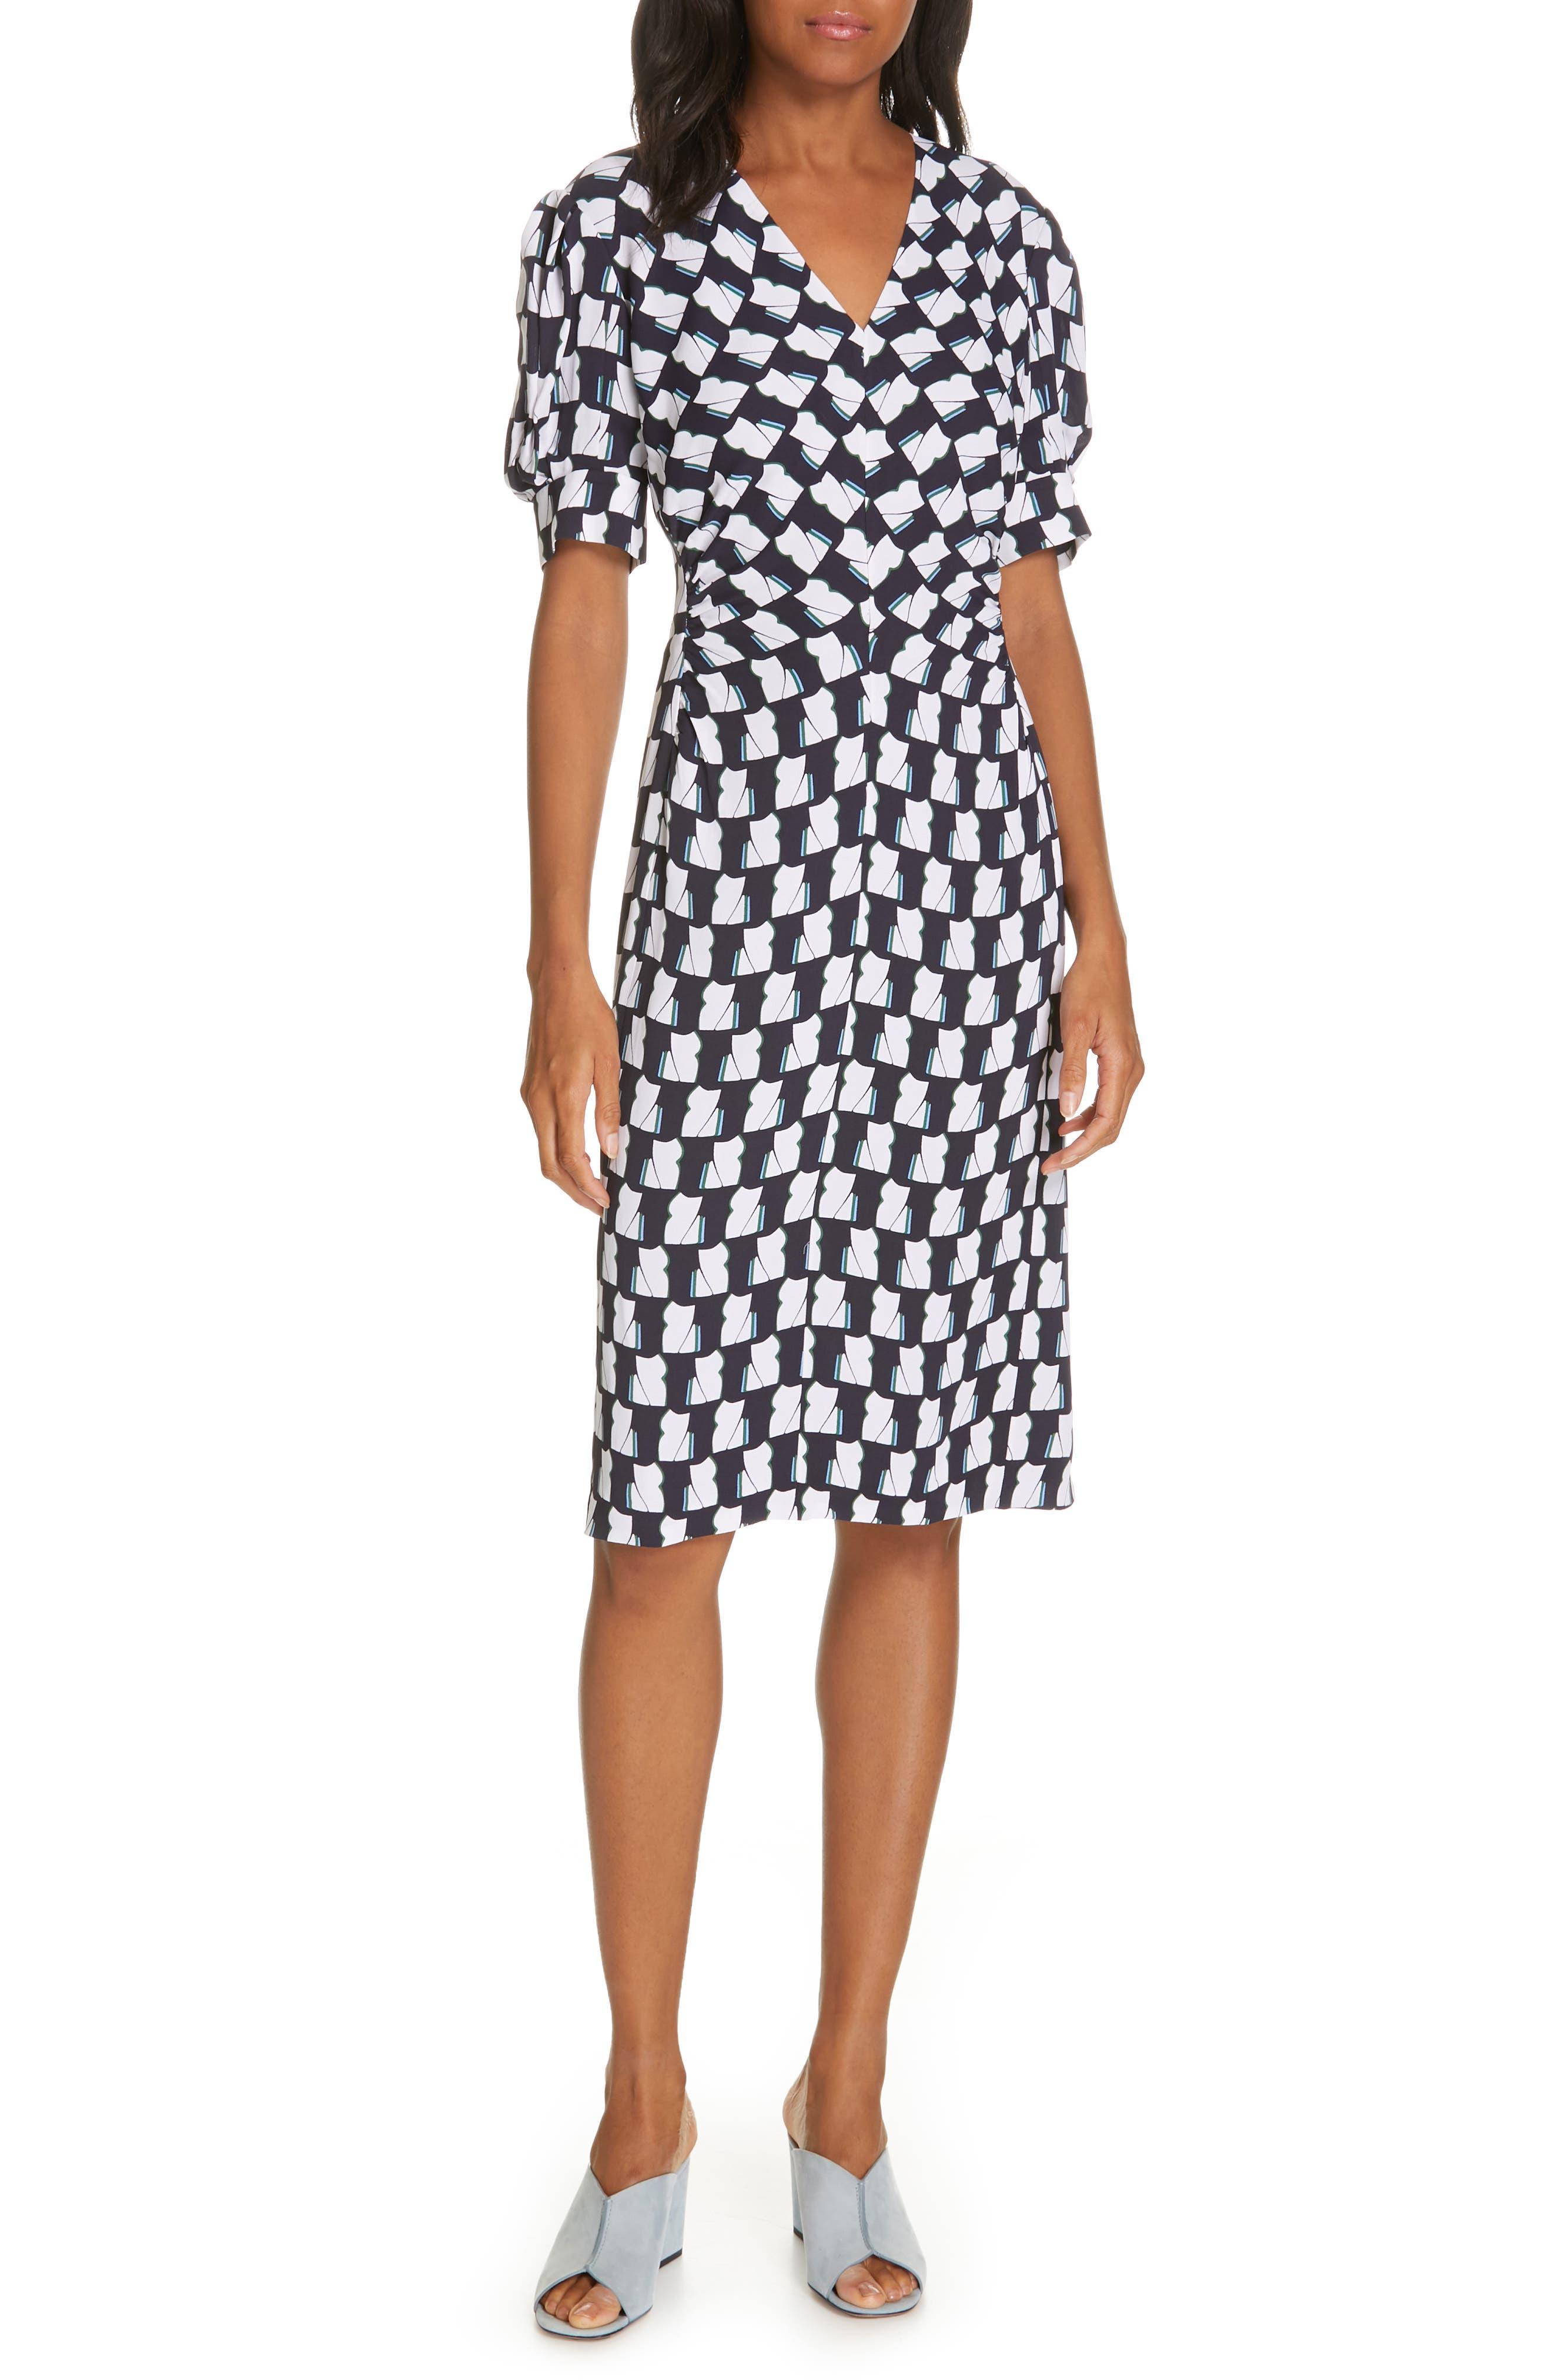 LEWIT, V-Neck Print Crepe Dress, Main thumbnail 1, color, 410